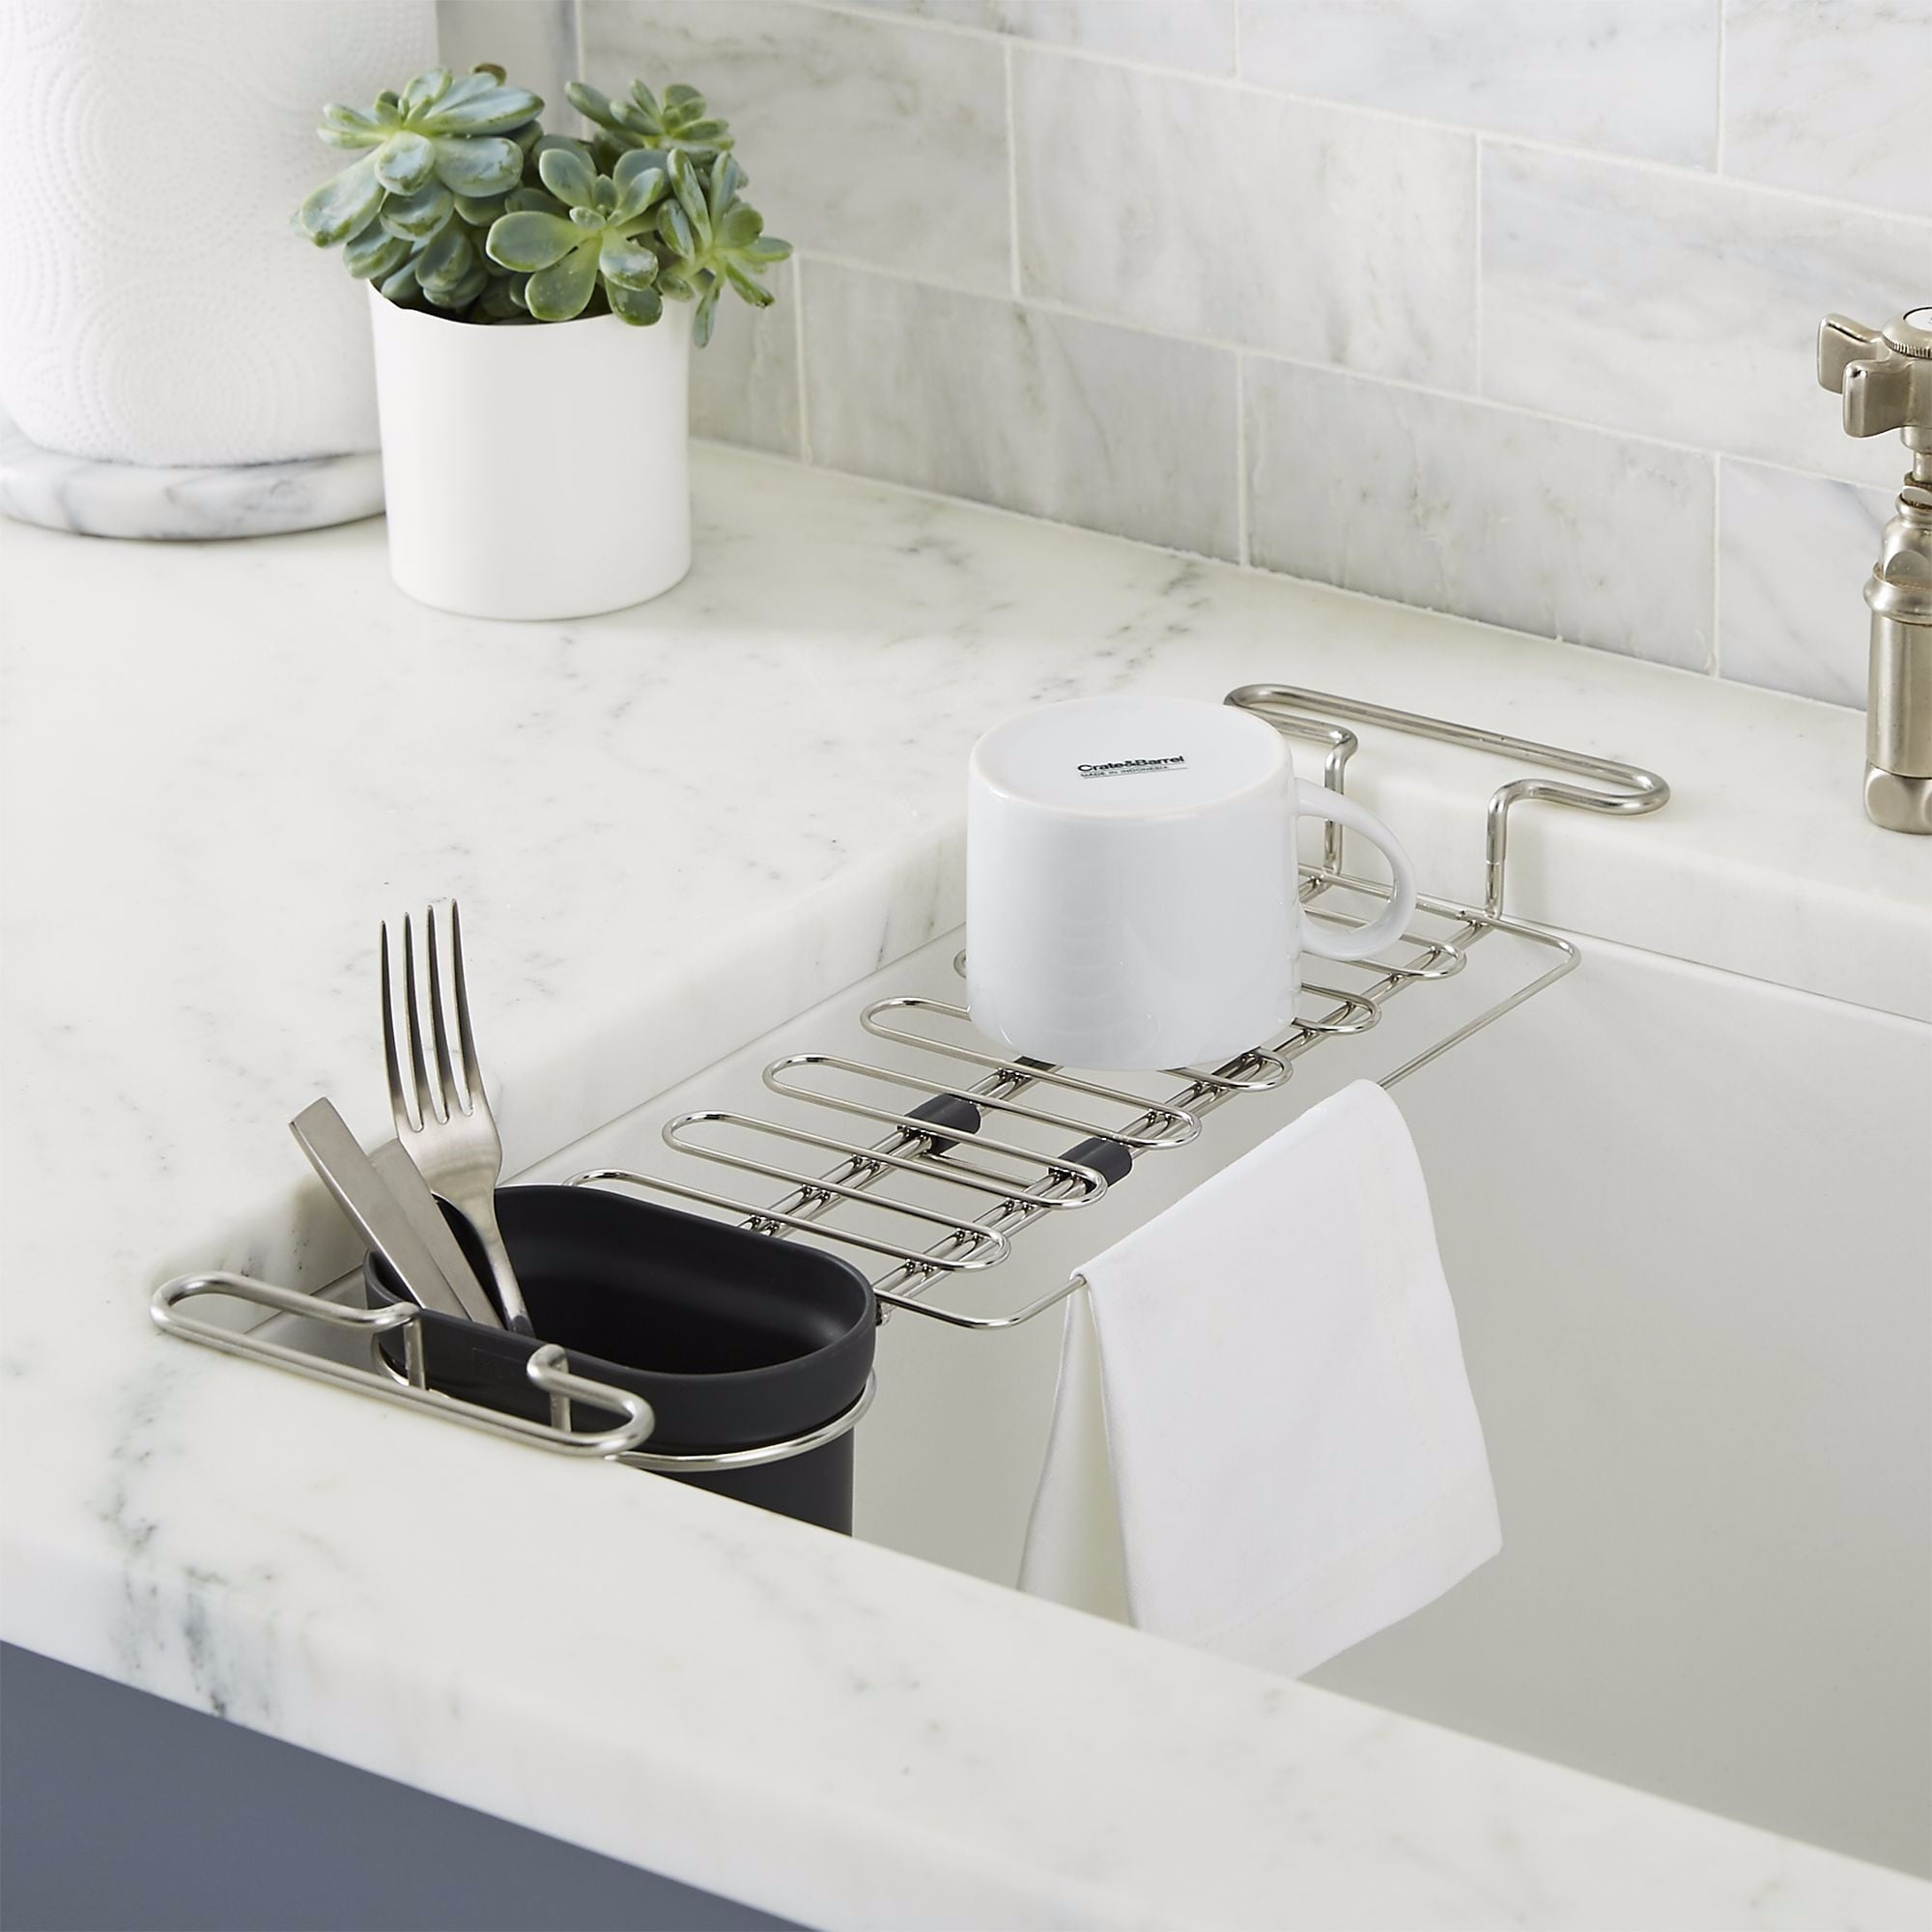 Soap Dispenser With Sponge Holder | Kitchen Sink Organization ...